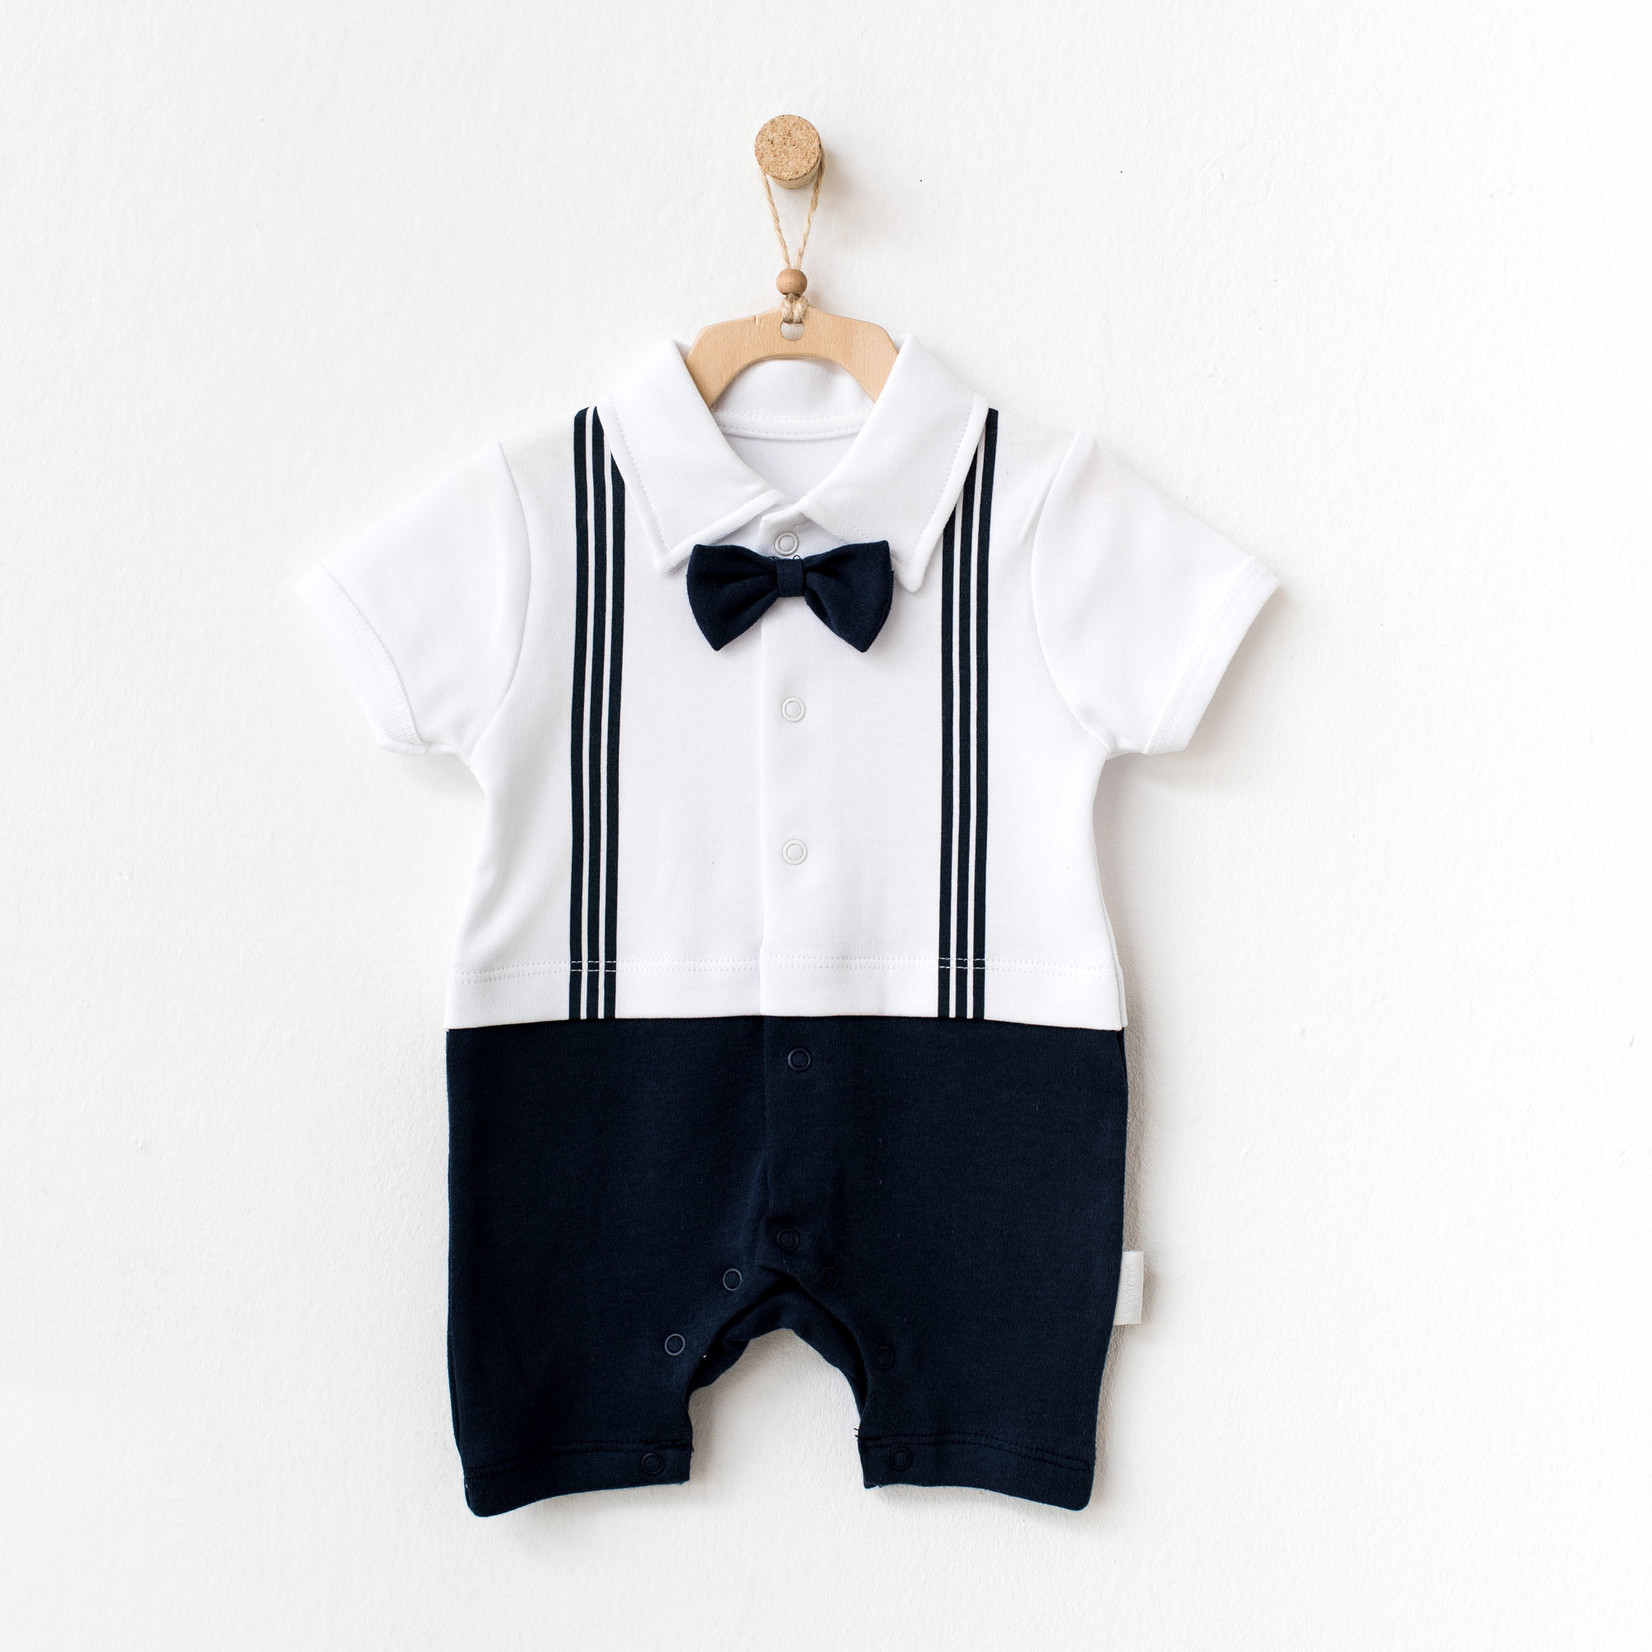 Babyjongens Pakje met Vlinderdas Donkerblauw